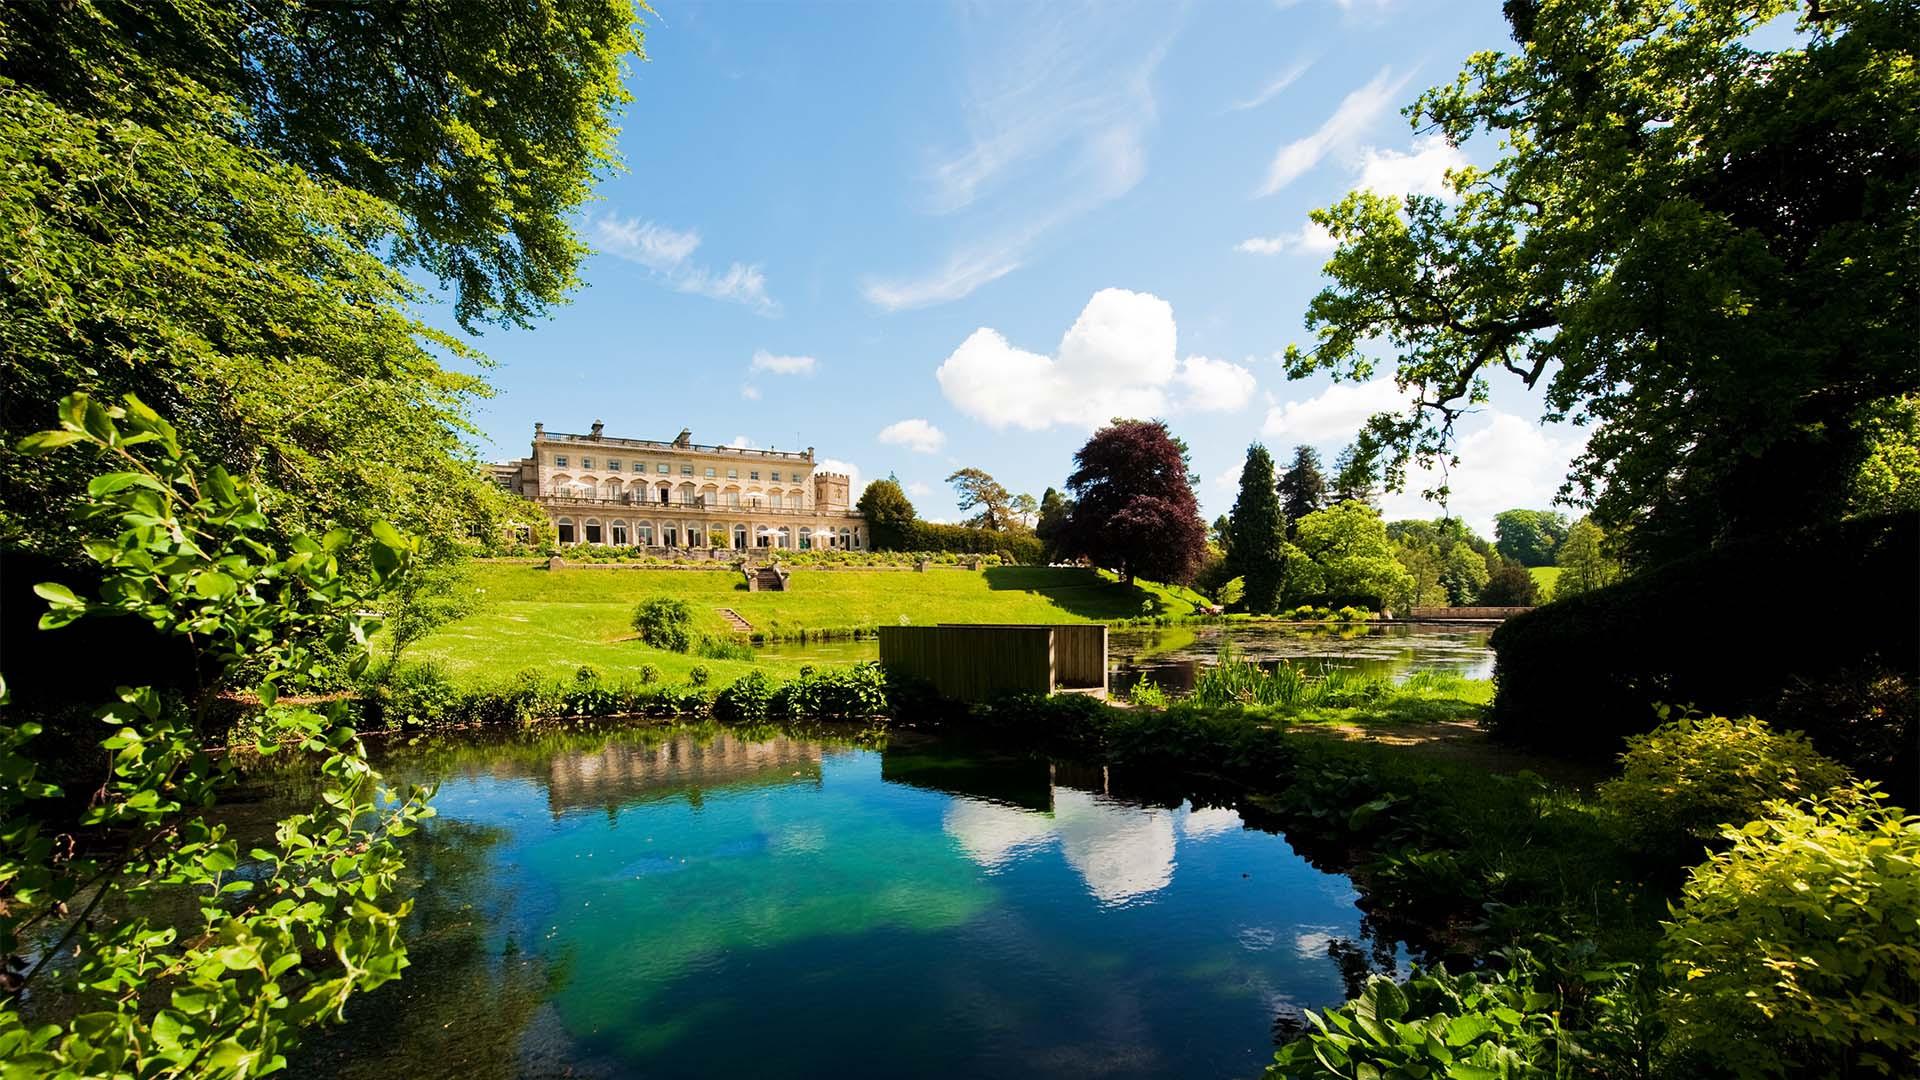 Cowley Manor, near Cheltenham, Gloucestershire